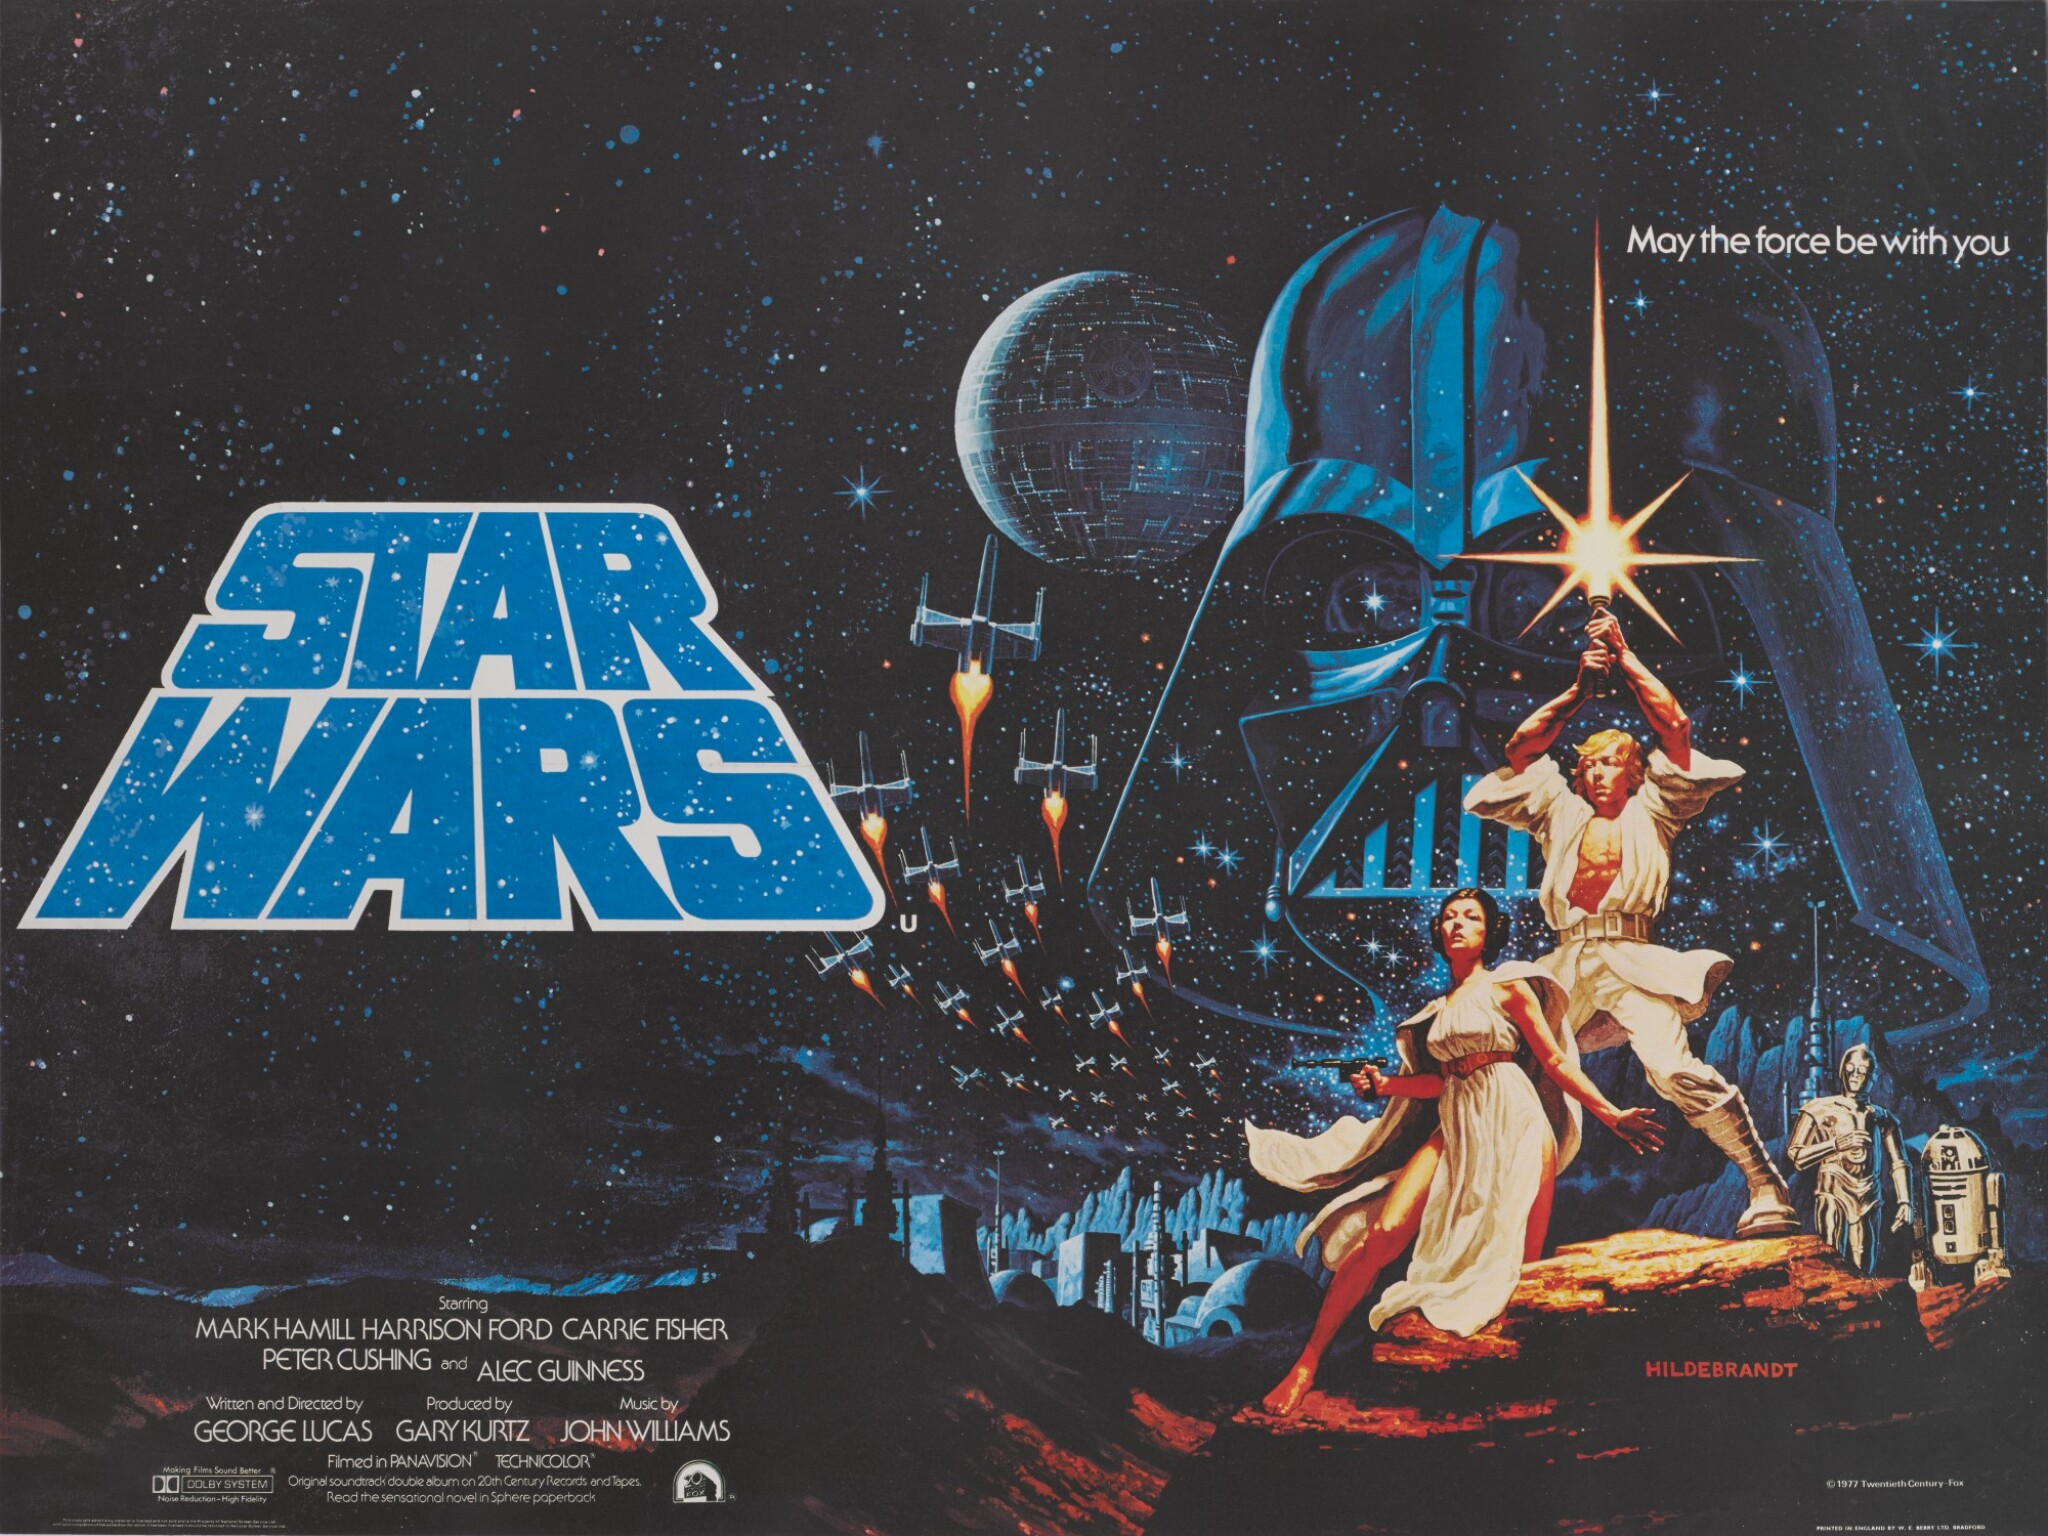 STAR WARS, BRITISH RELEASE POSTER, THE HILDEBRANDT BROTHERS, 1977